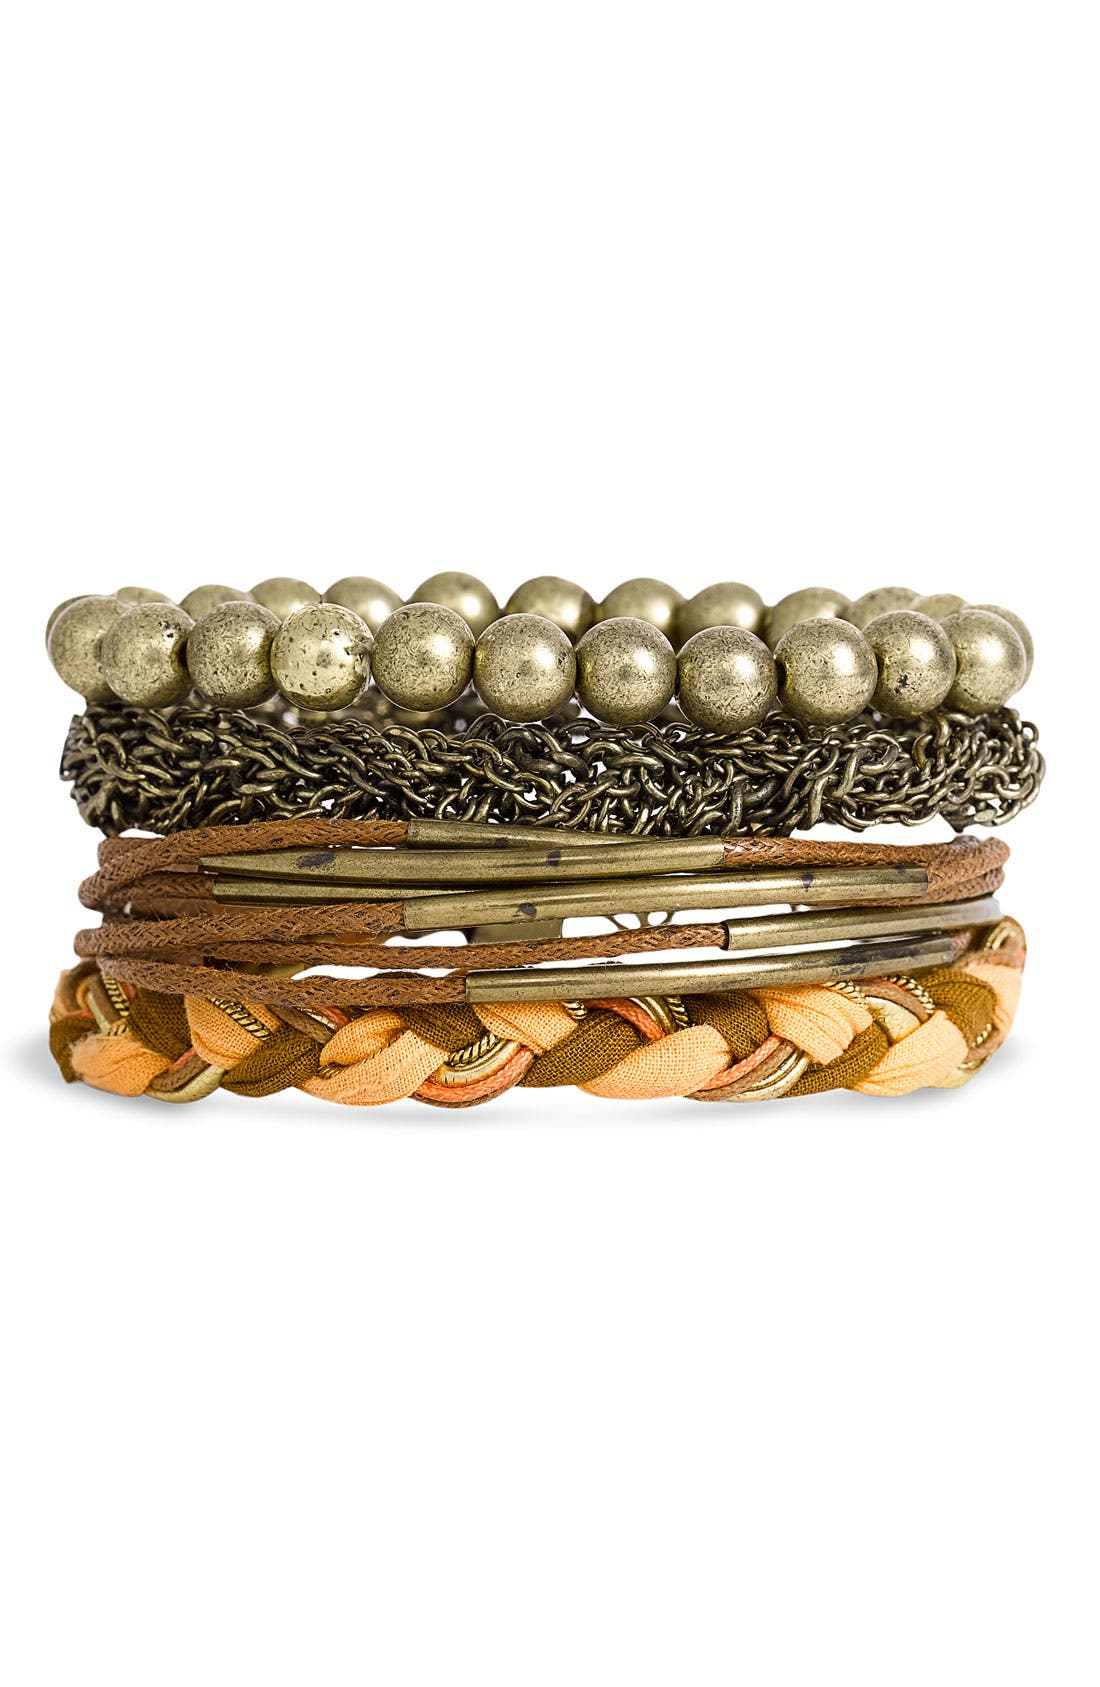 Alternate Image 1 Selected - Stephan & Co. Mixed Media Bracelets (Set of 4)